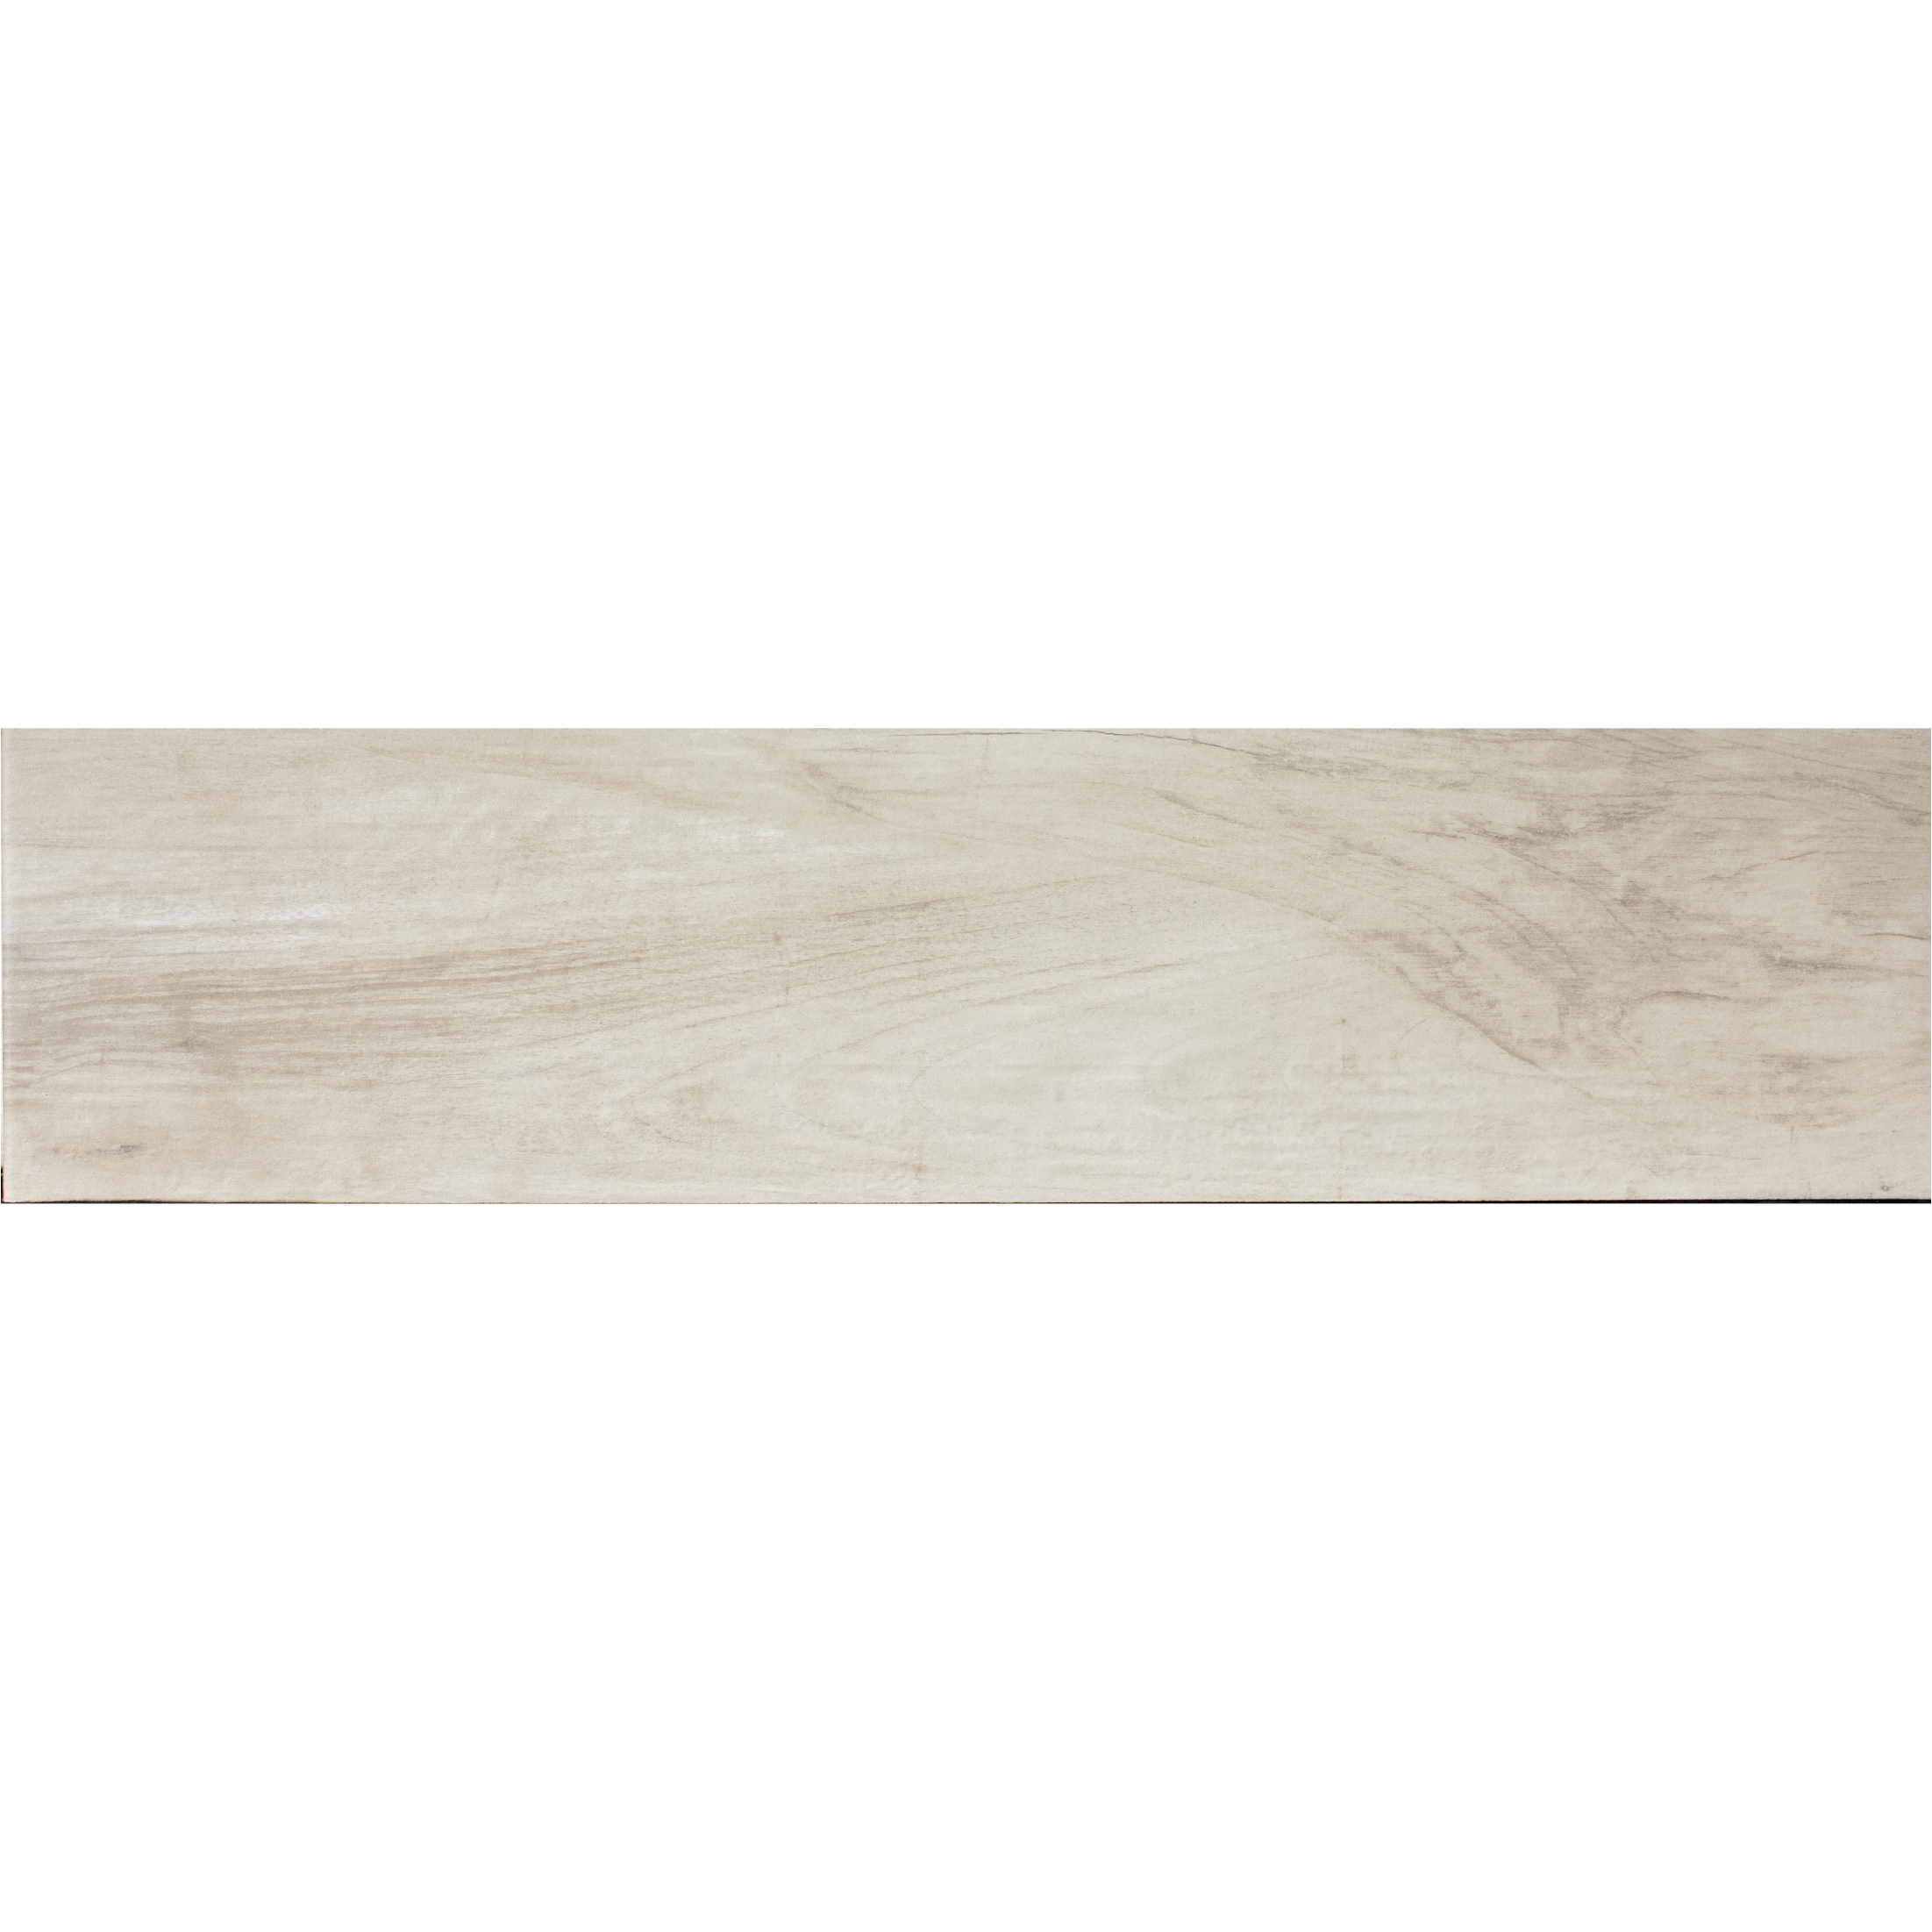 Gresie portelanata interior Bien Picasso Maple cu aspect parchet, bej, PEI 4, dreptunghiulara, 15 x 60 cm mathaus 2021